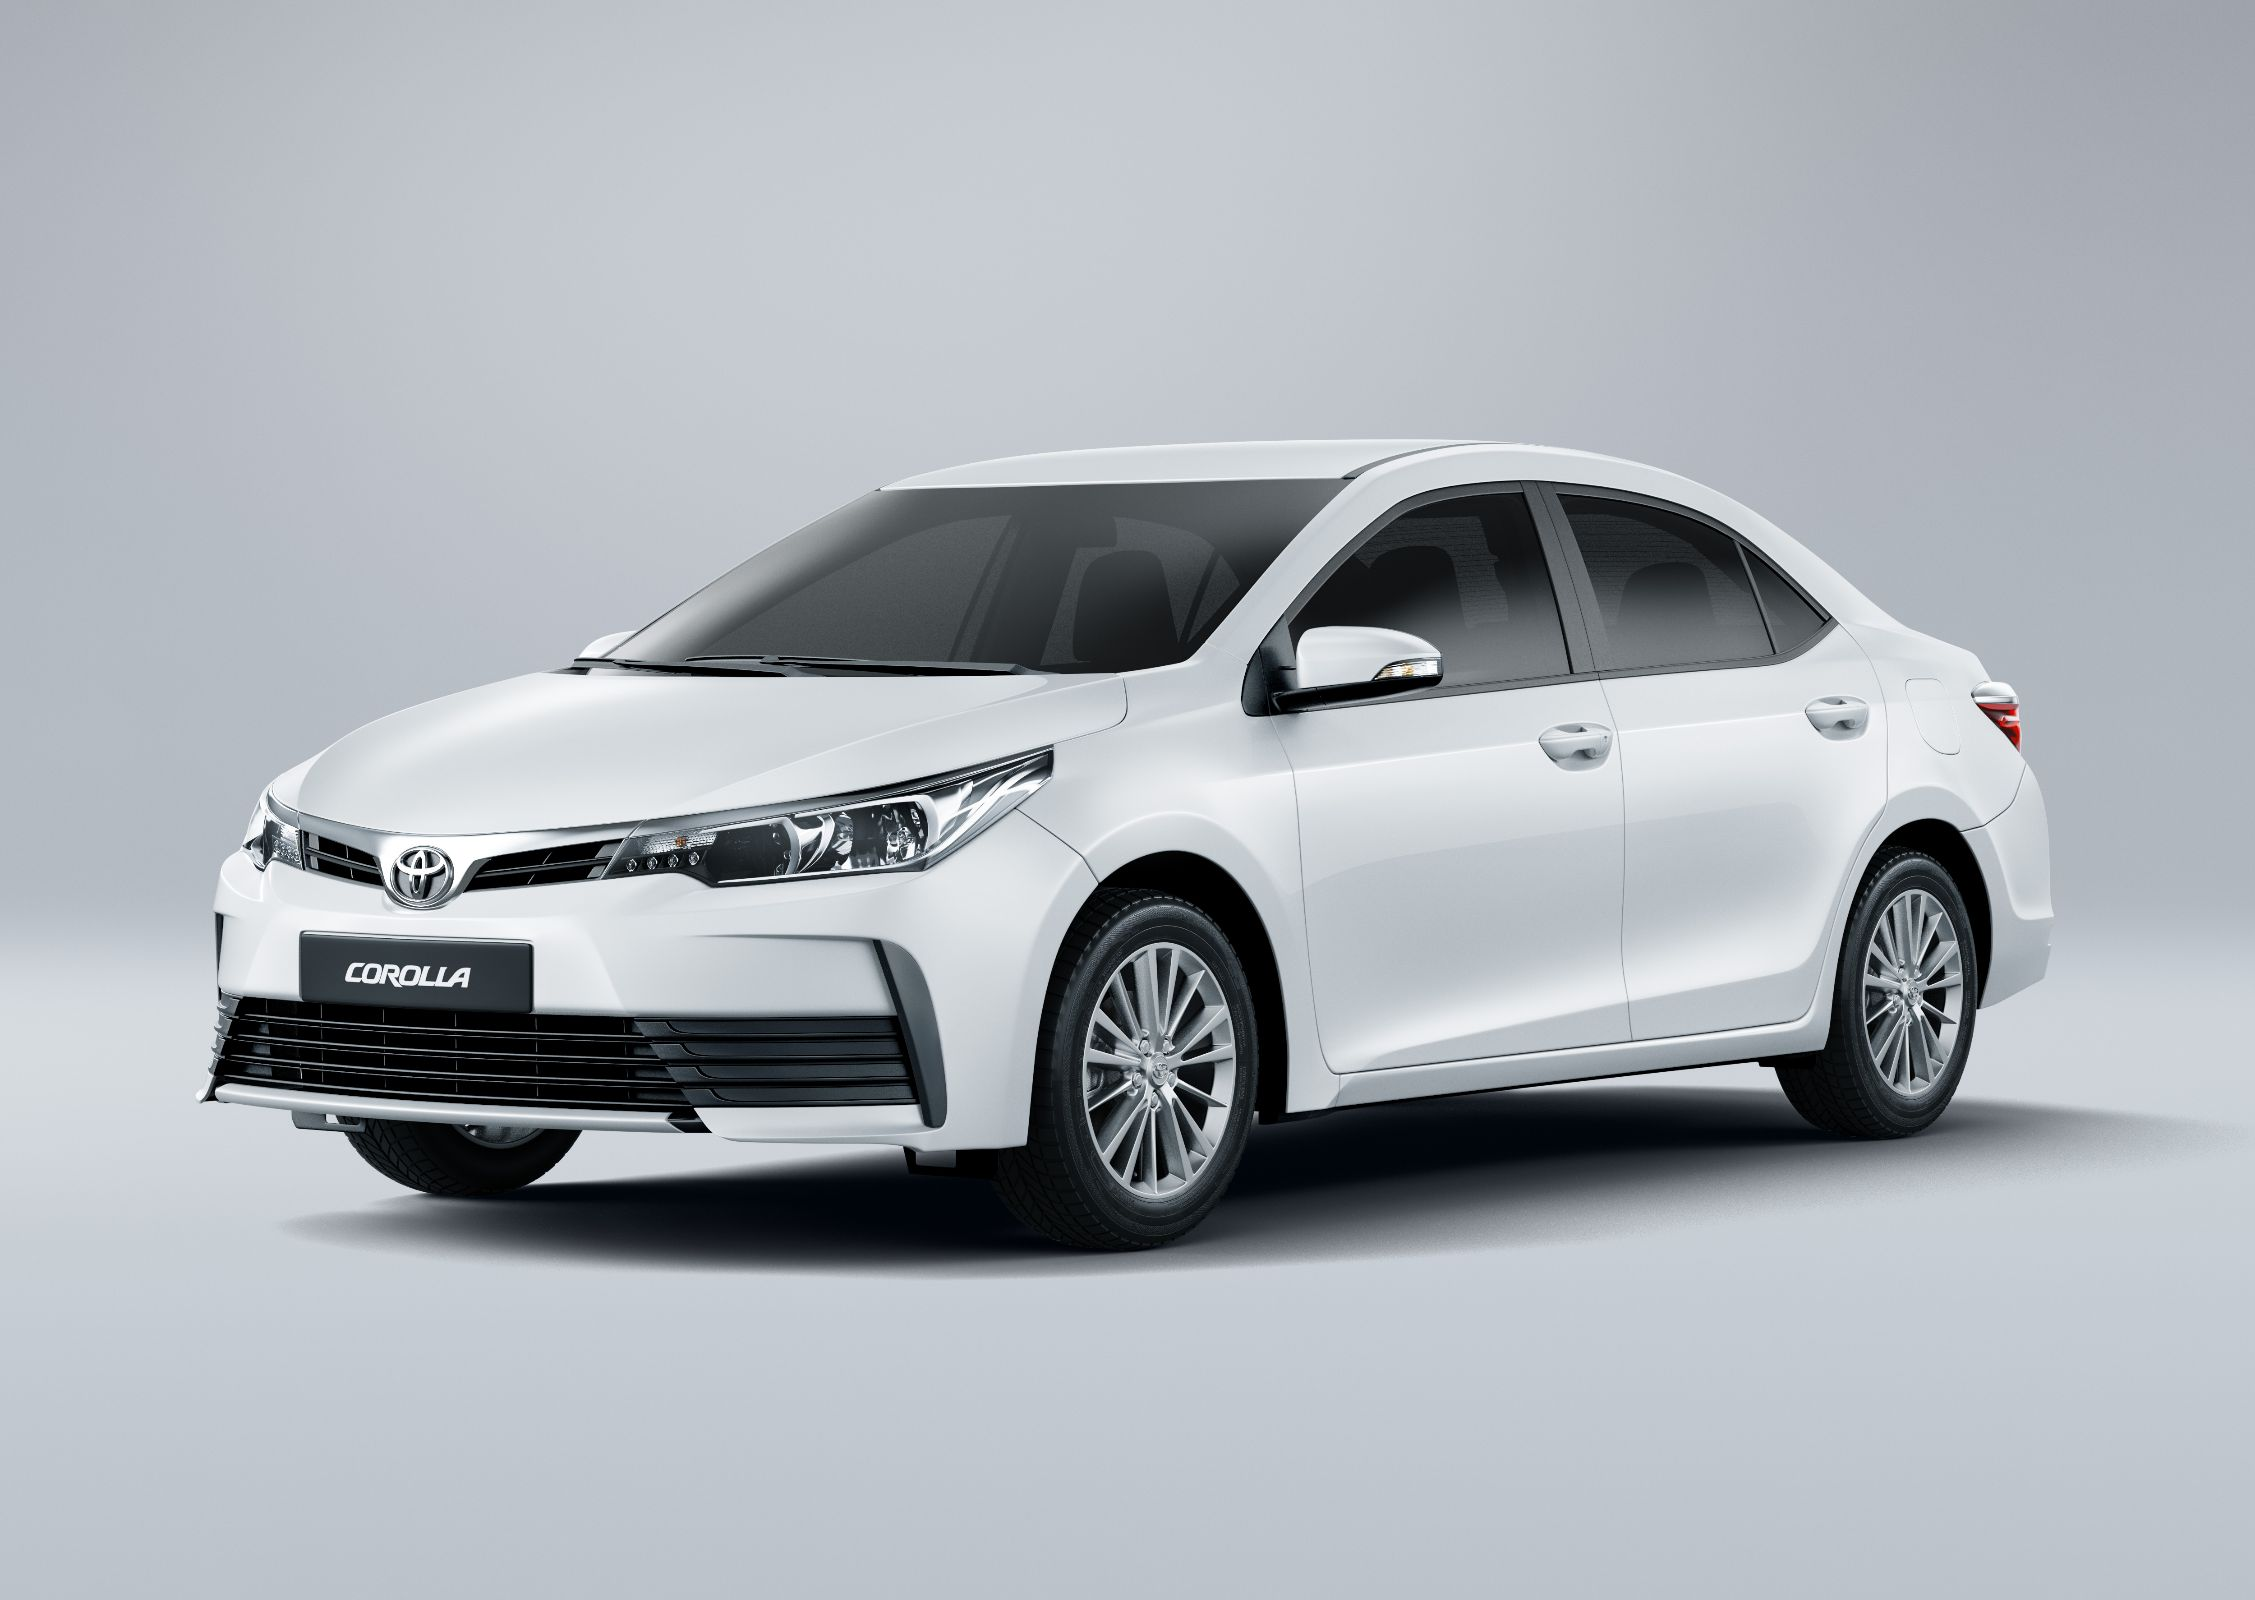 A Toyota anunciou desconto especial para o Corolla para PcD e para a versão destinada aos Taxistas. Benefício só é válido até novembro de 2018.